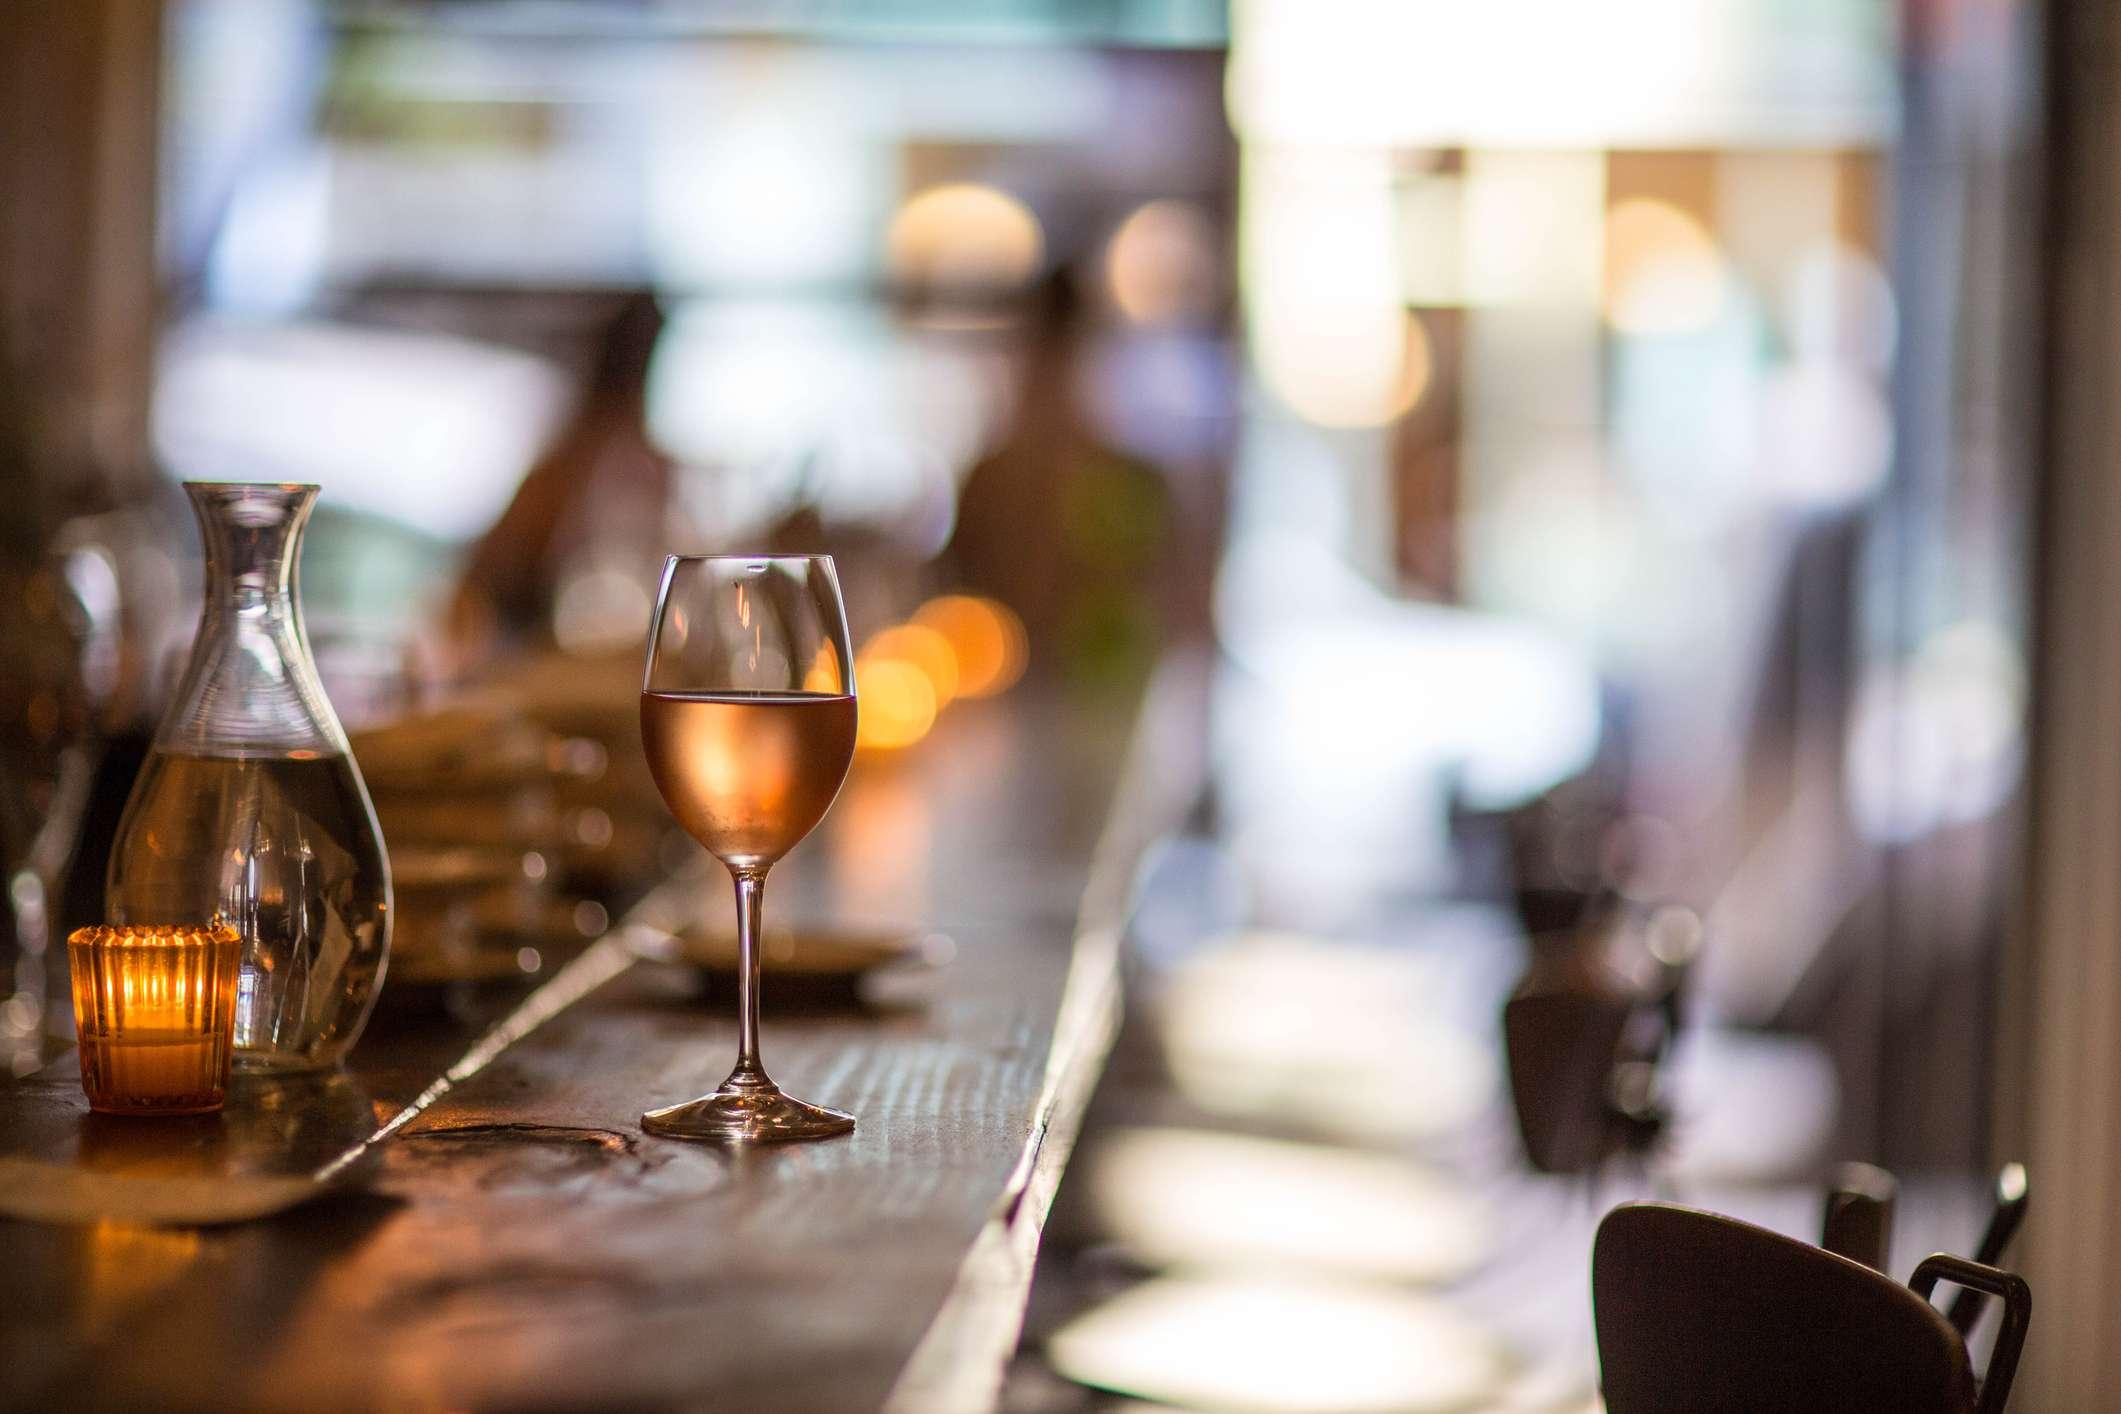 Seattle wine bars